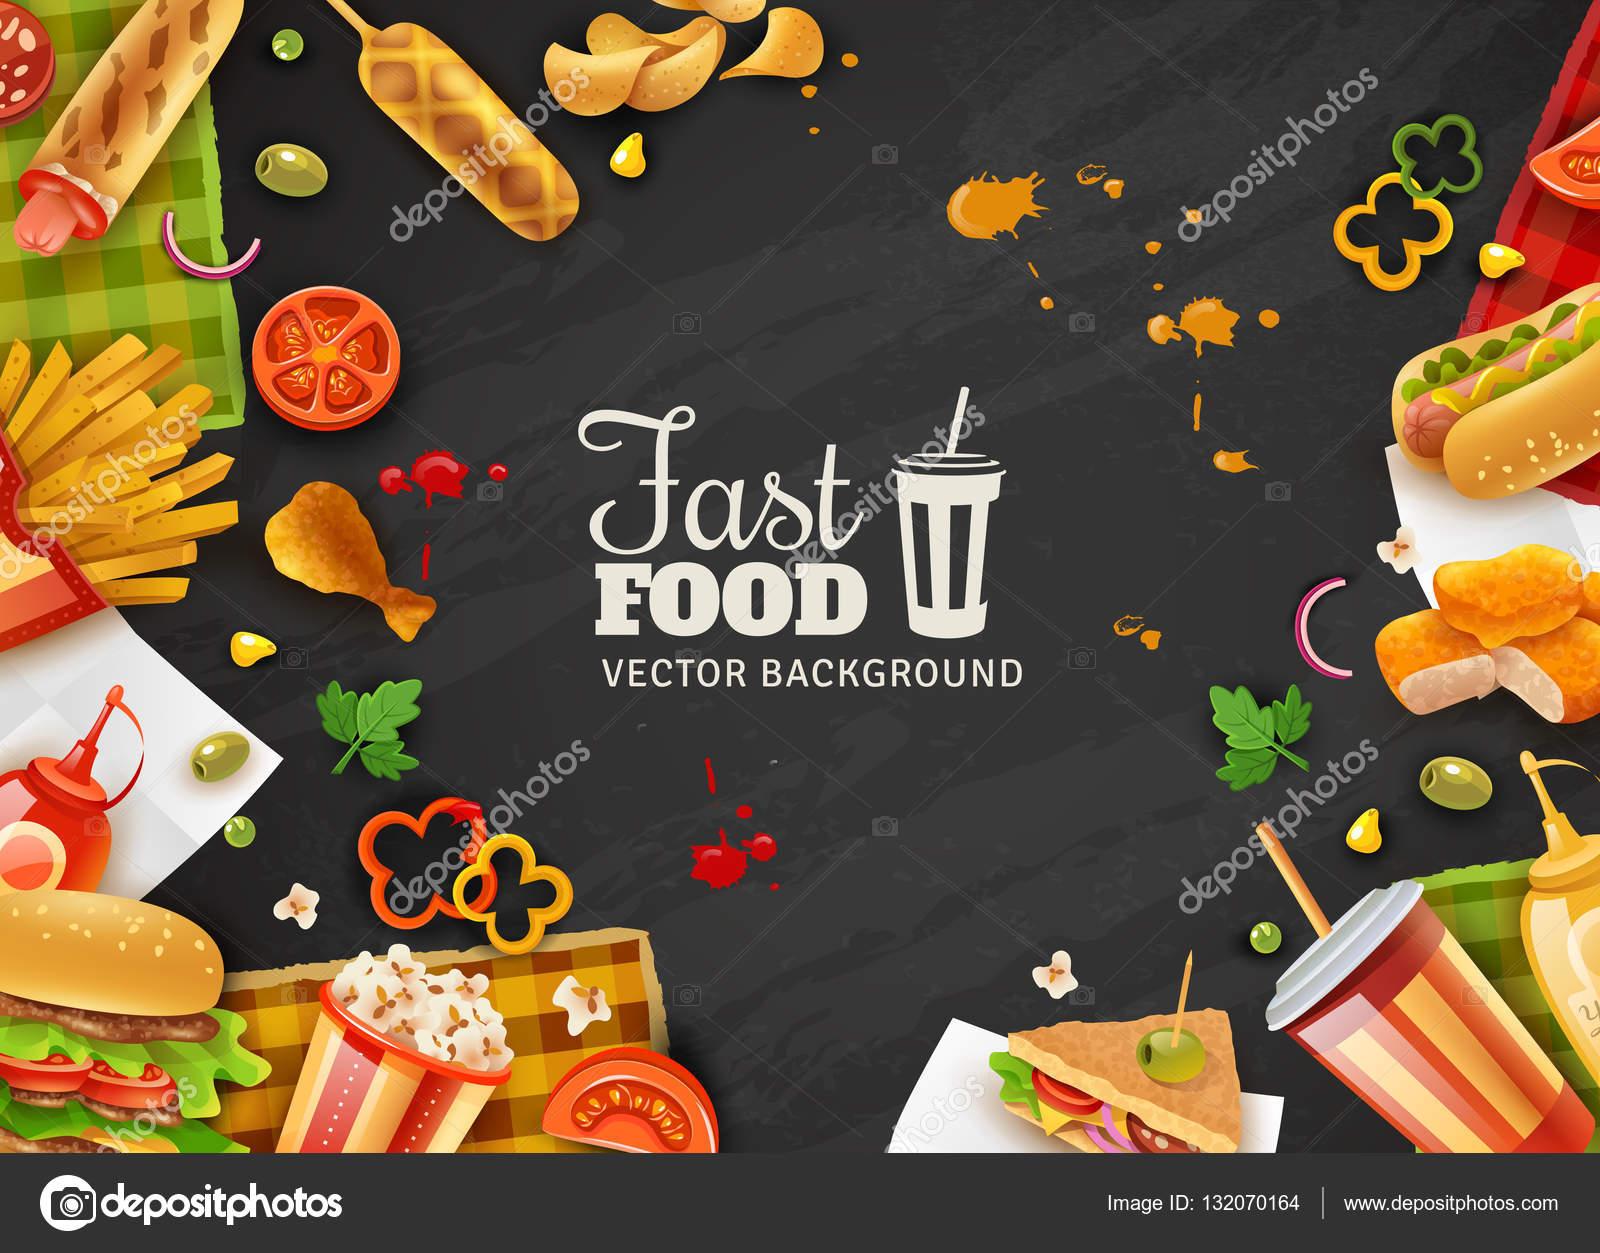 Fondo Para Comida Rapida: Fast Food Siyah Arka Plan Afiş